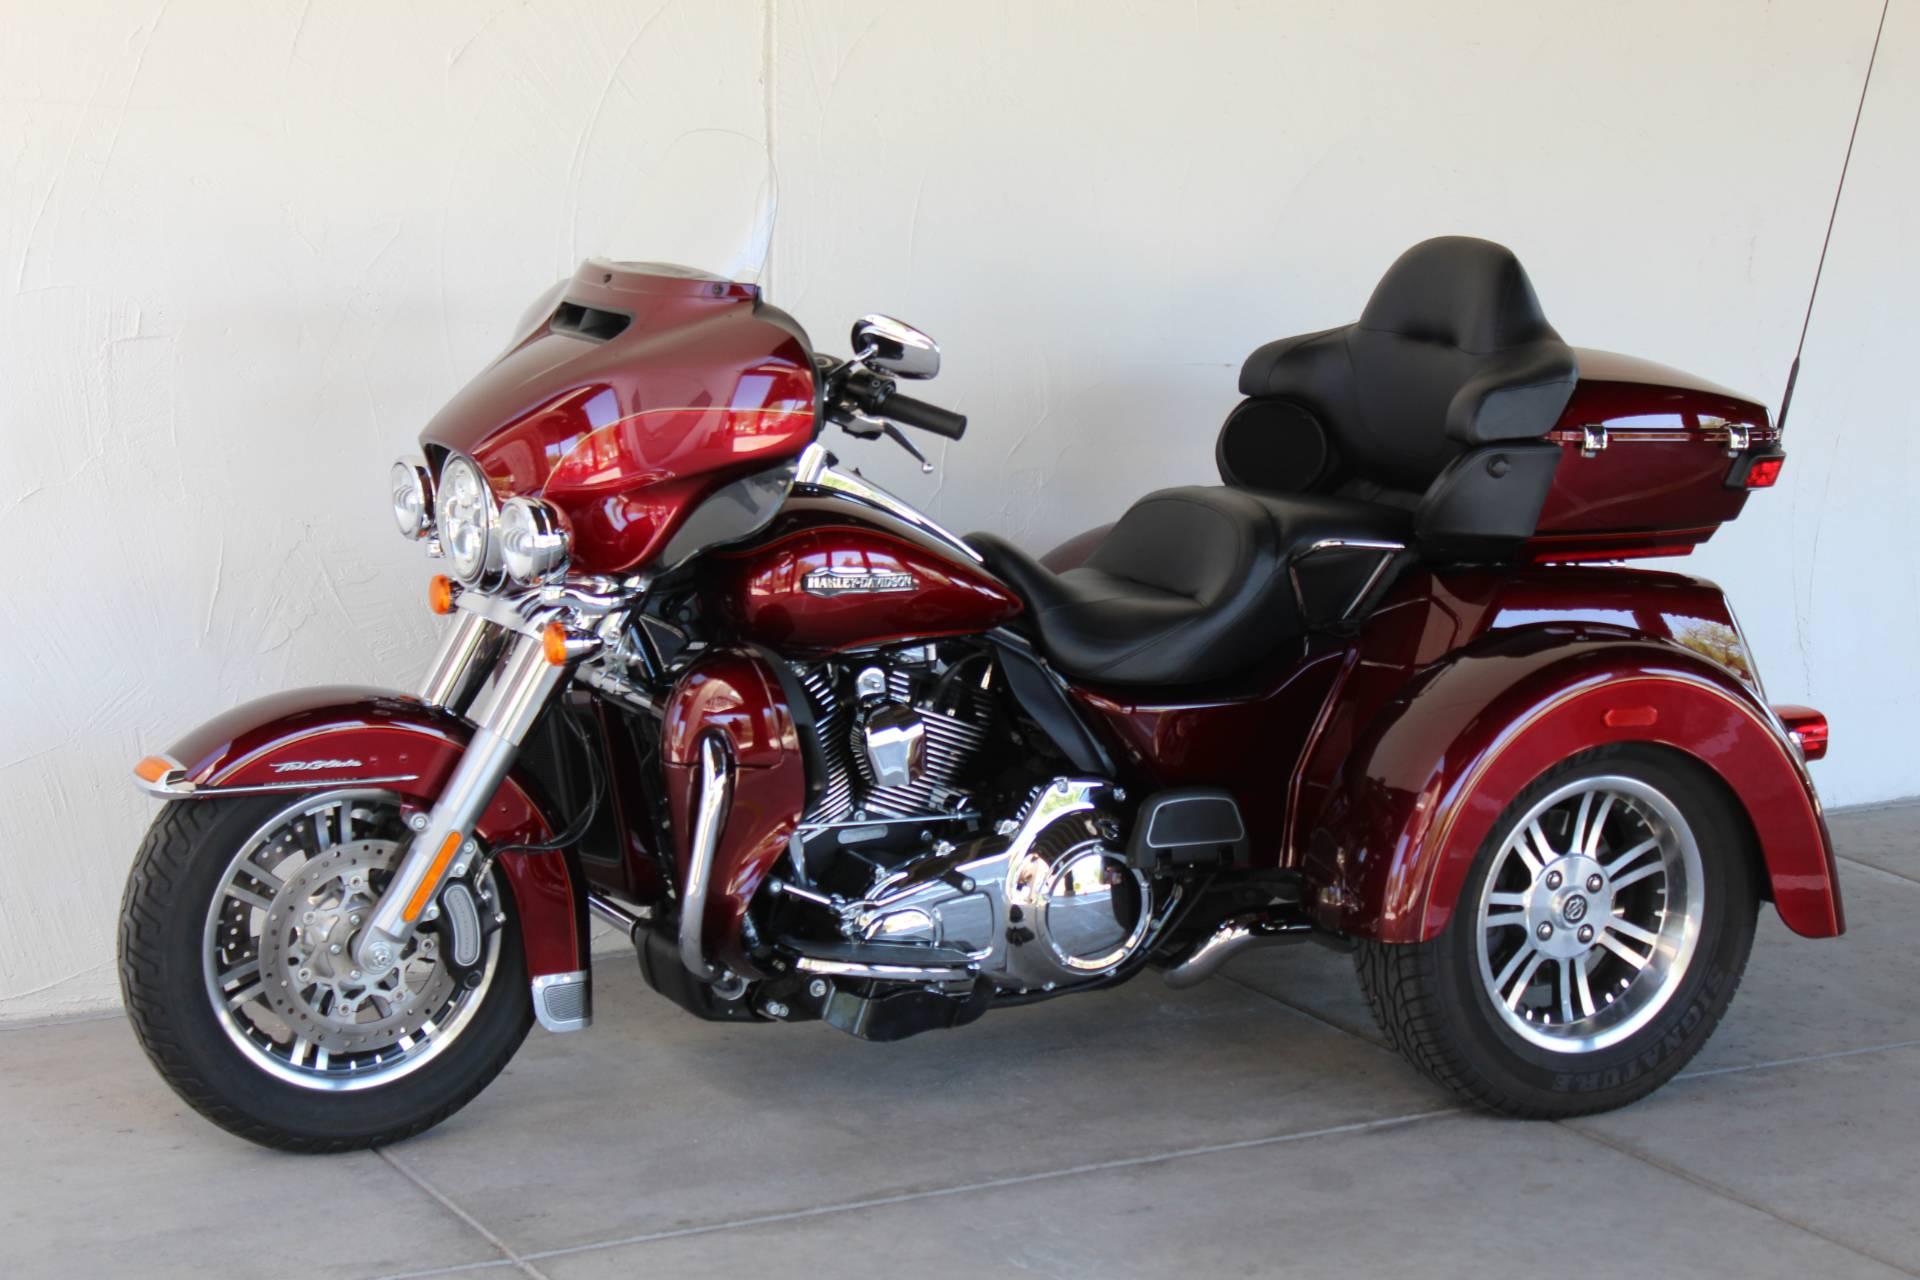 2016 Harley Davidson Tri Glide Ultra Gallery 670252: 2016 Harley-Davidson Tri Glide® Ultra Trikes Apache